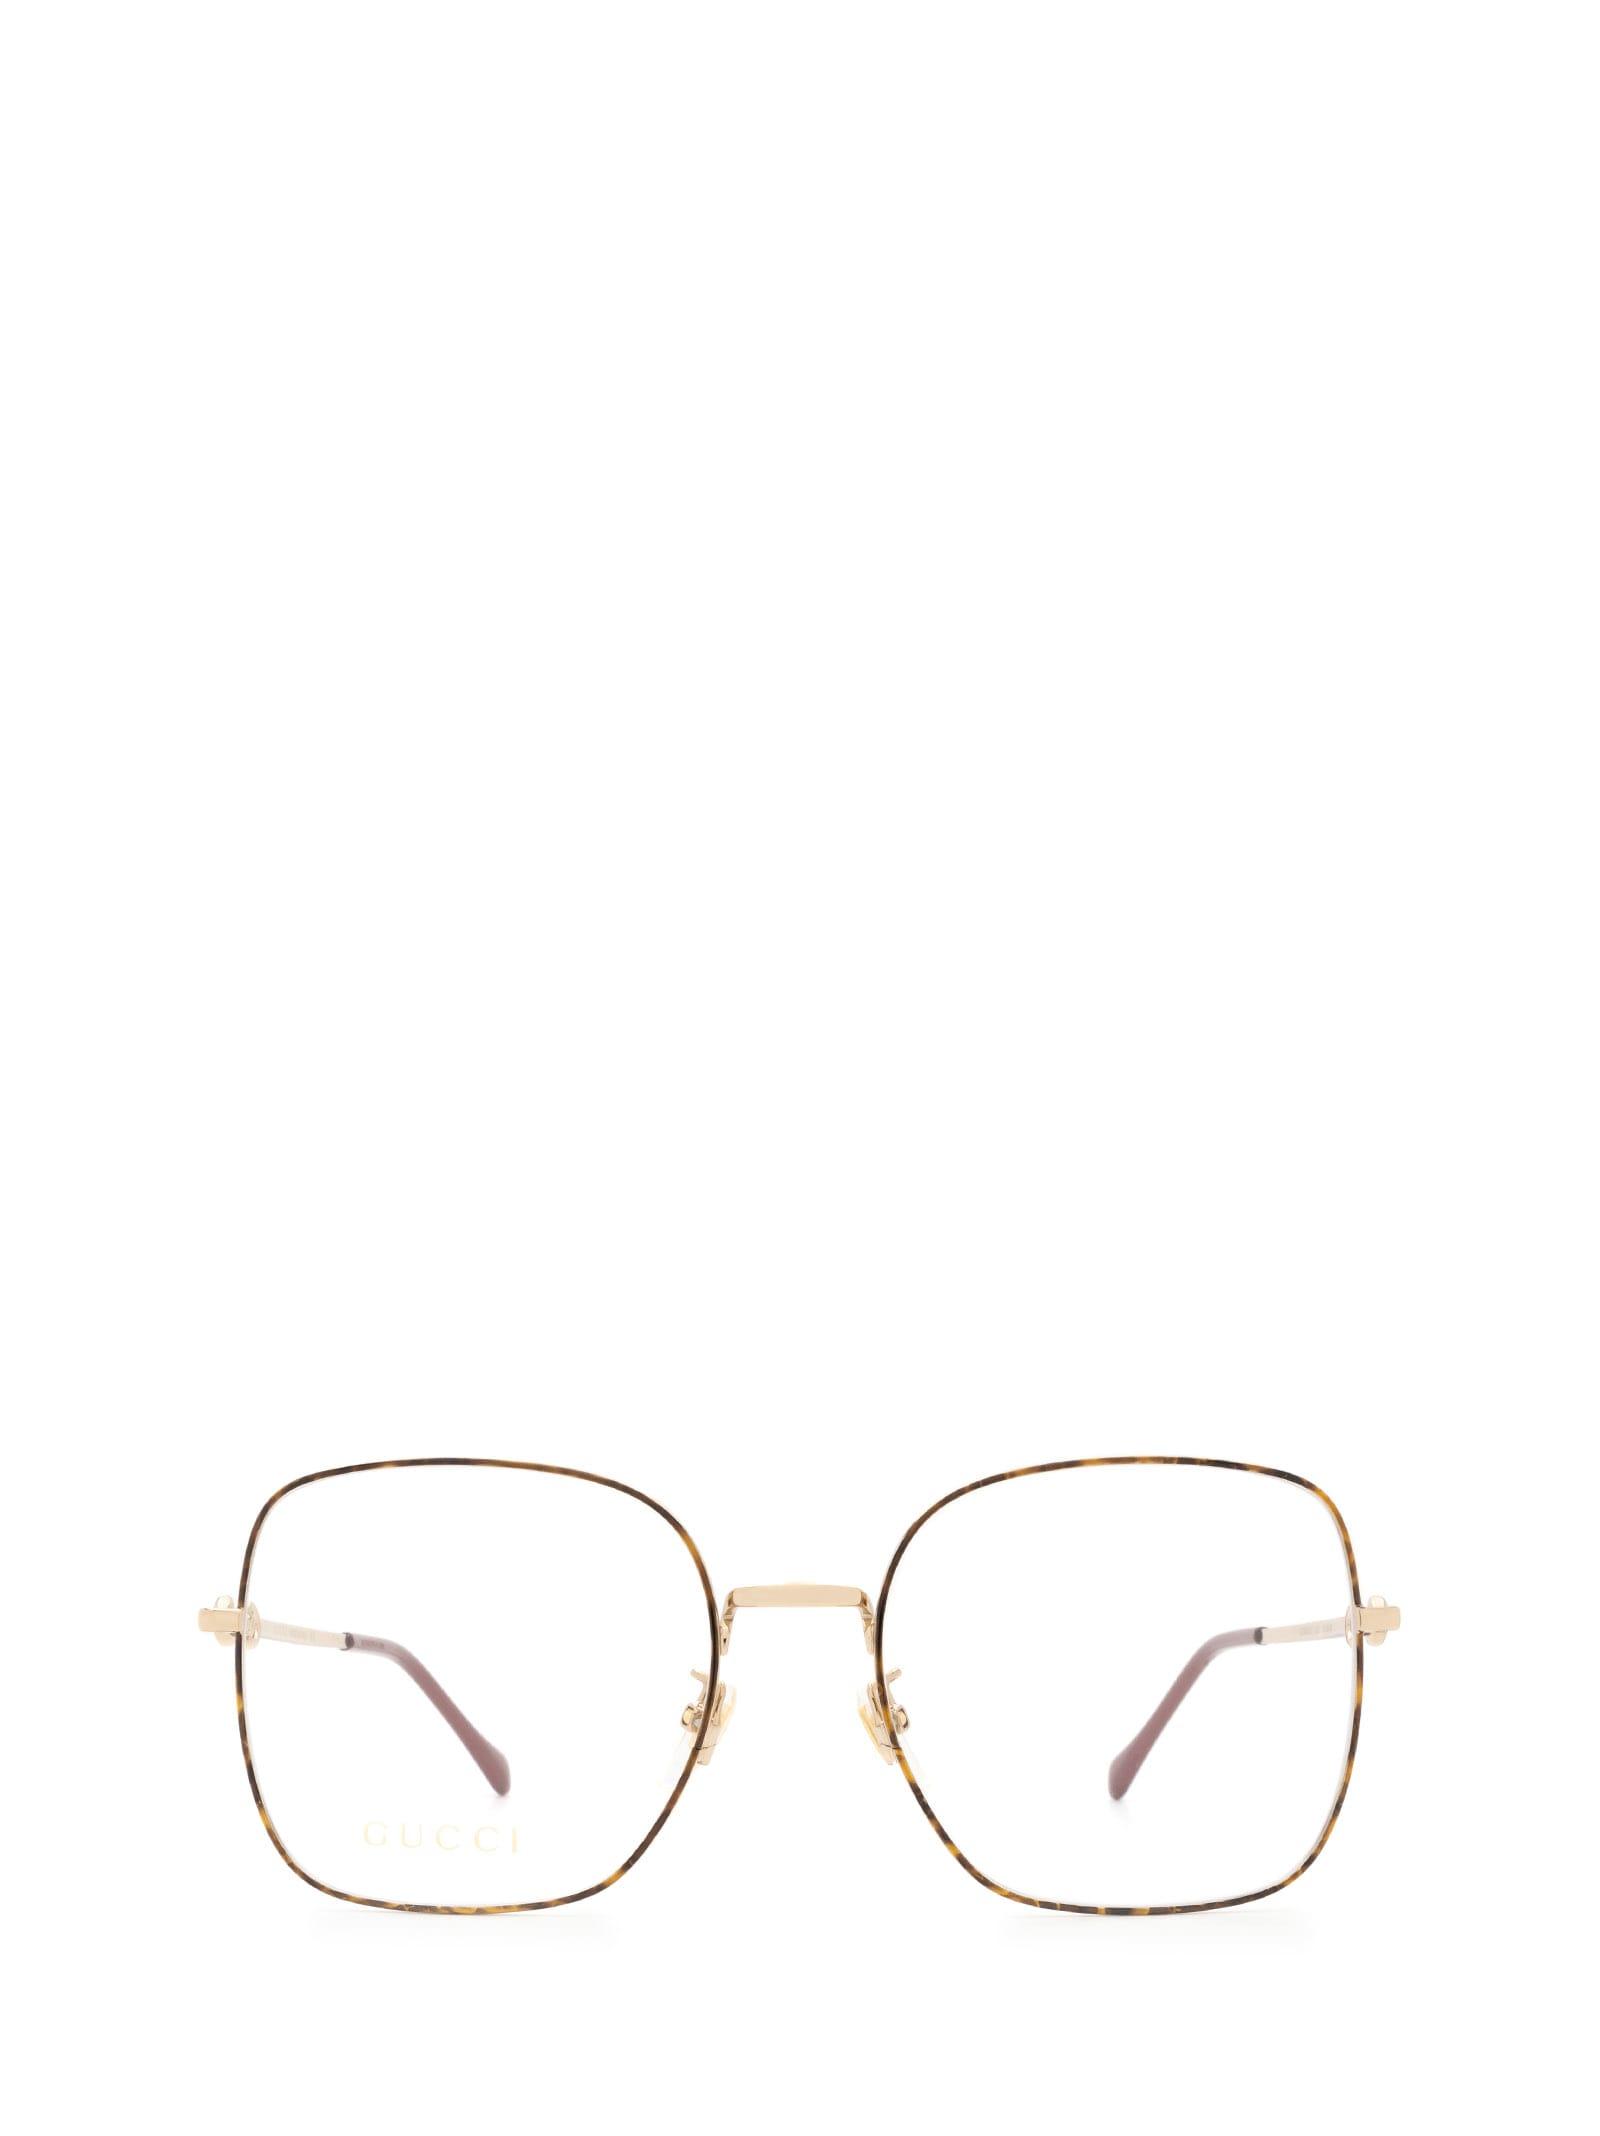 Gucci Opticals GG0883OA HAVANA & GOLD GLASSES